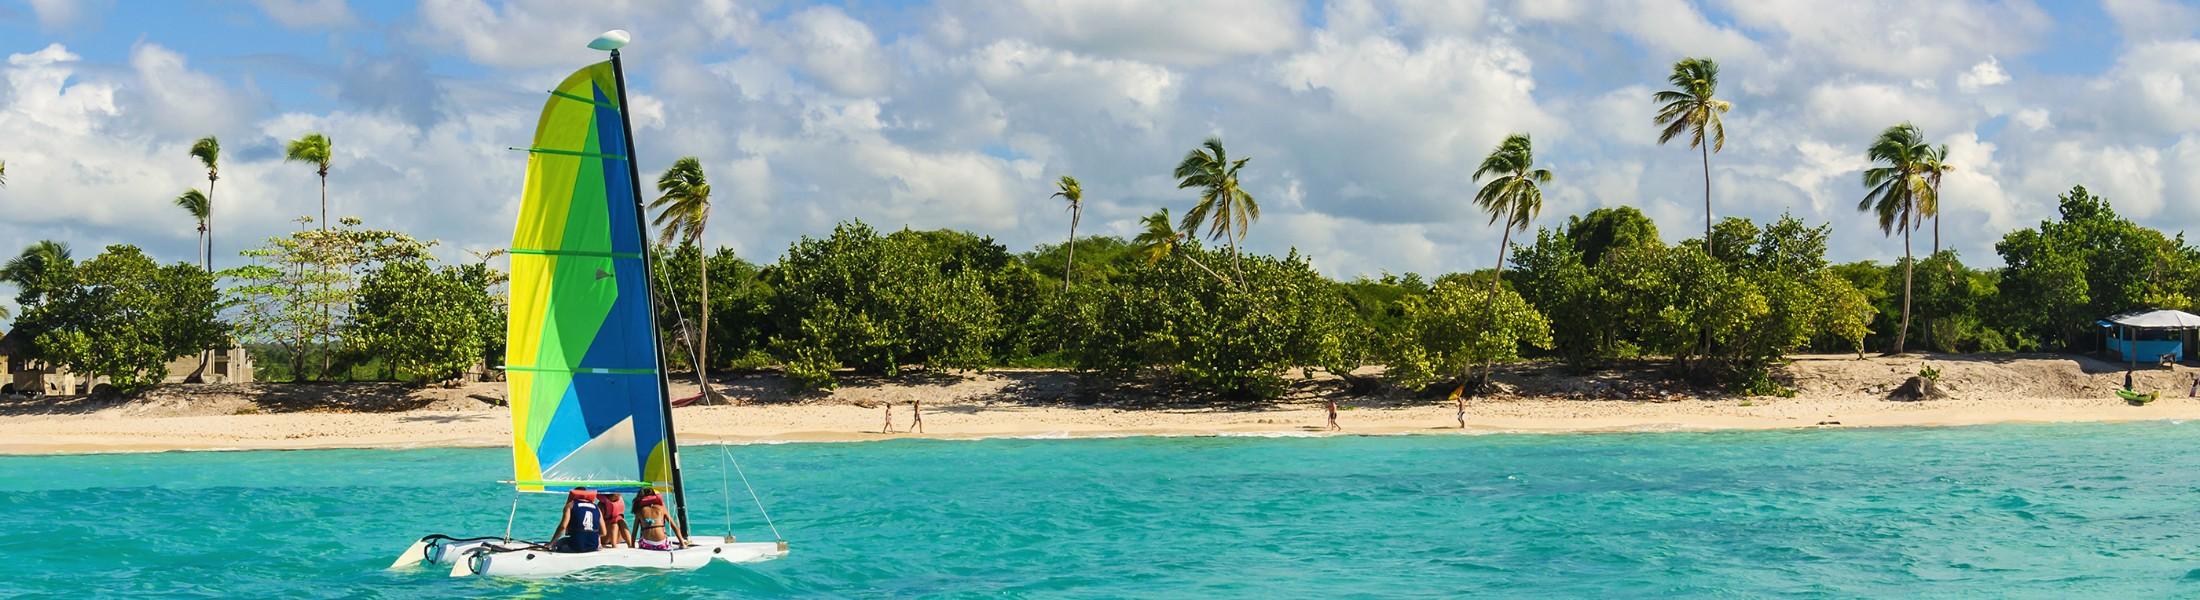 Windsurfer off the coast of a Caribbean island